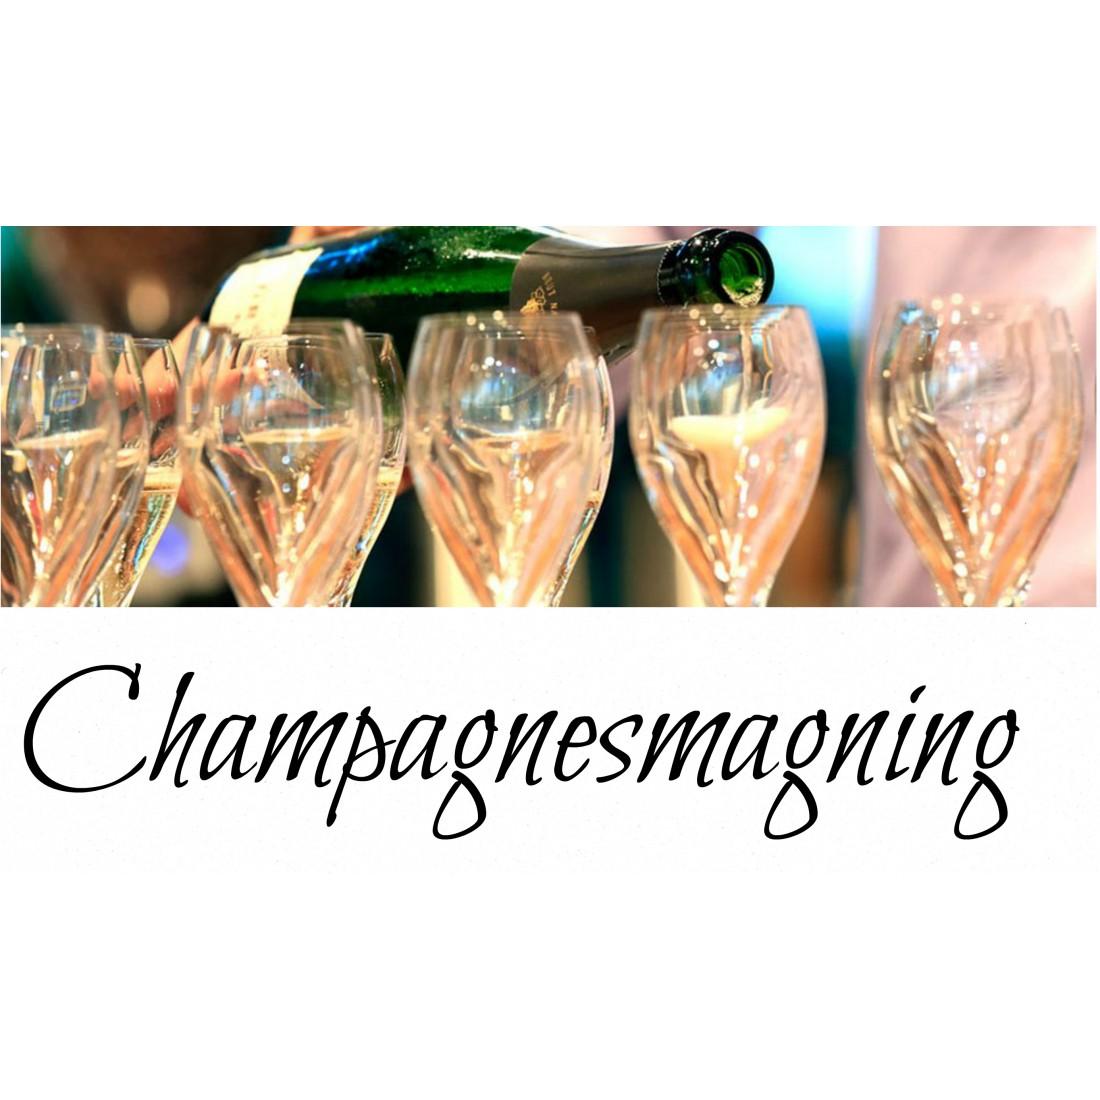 Champagnetasting saturday 26 september at 15.00 in Nyhavns Champagnebodega-31